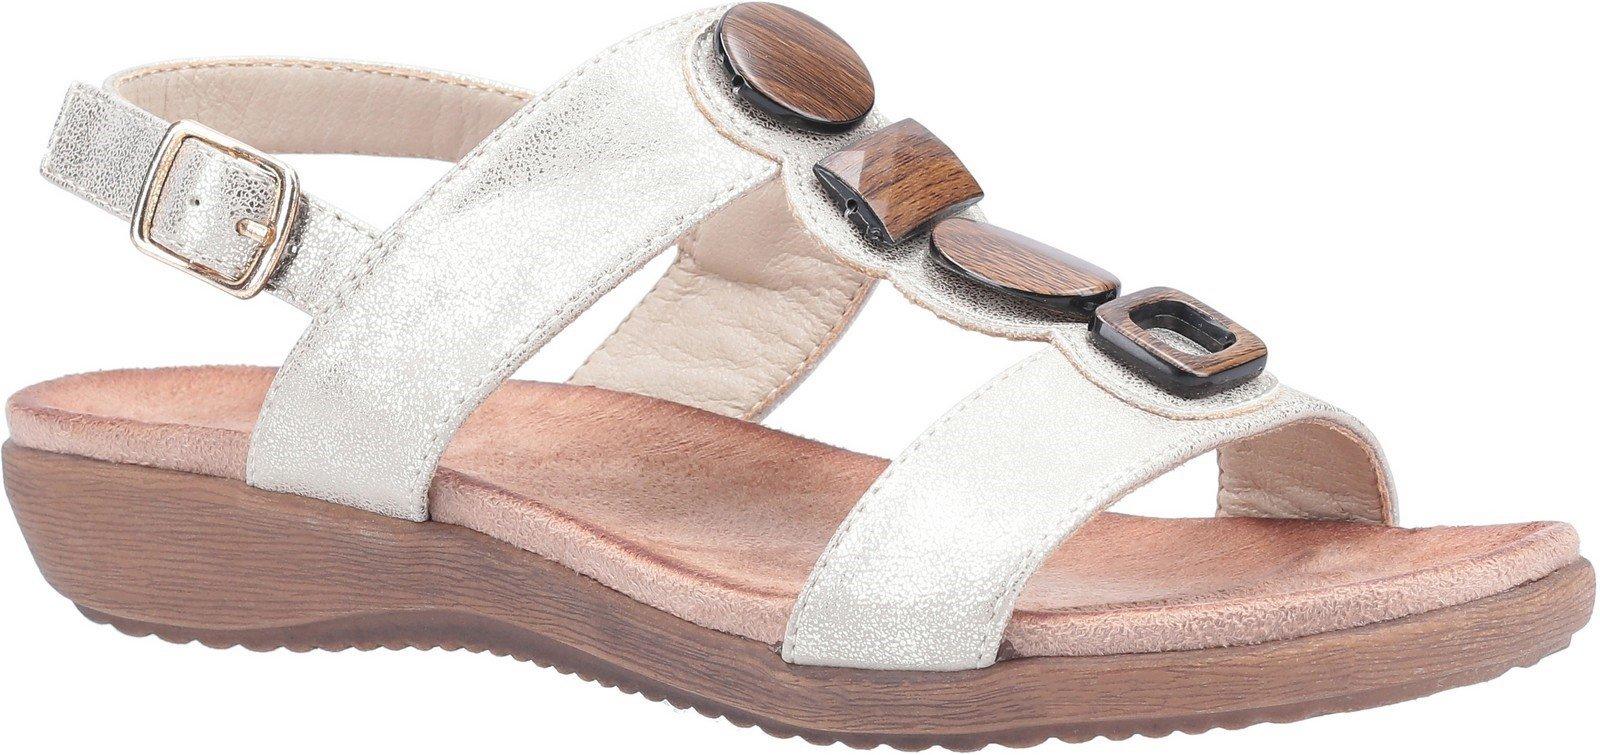 Fleet & Foster Women's Rosa Buckle Sandal Various Colours 30101 - Beige 3